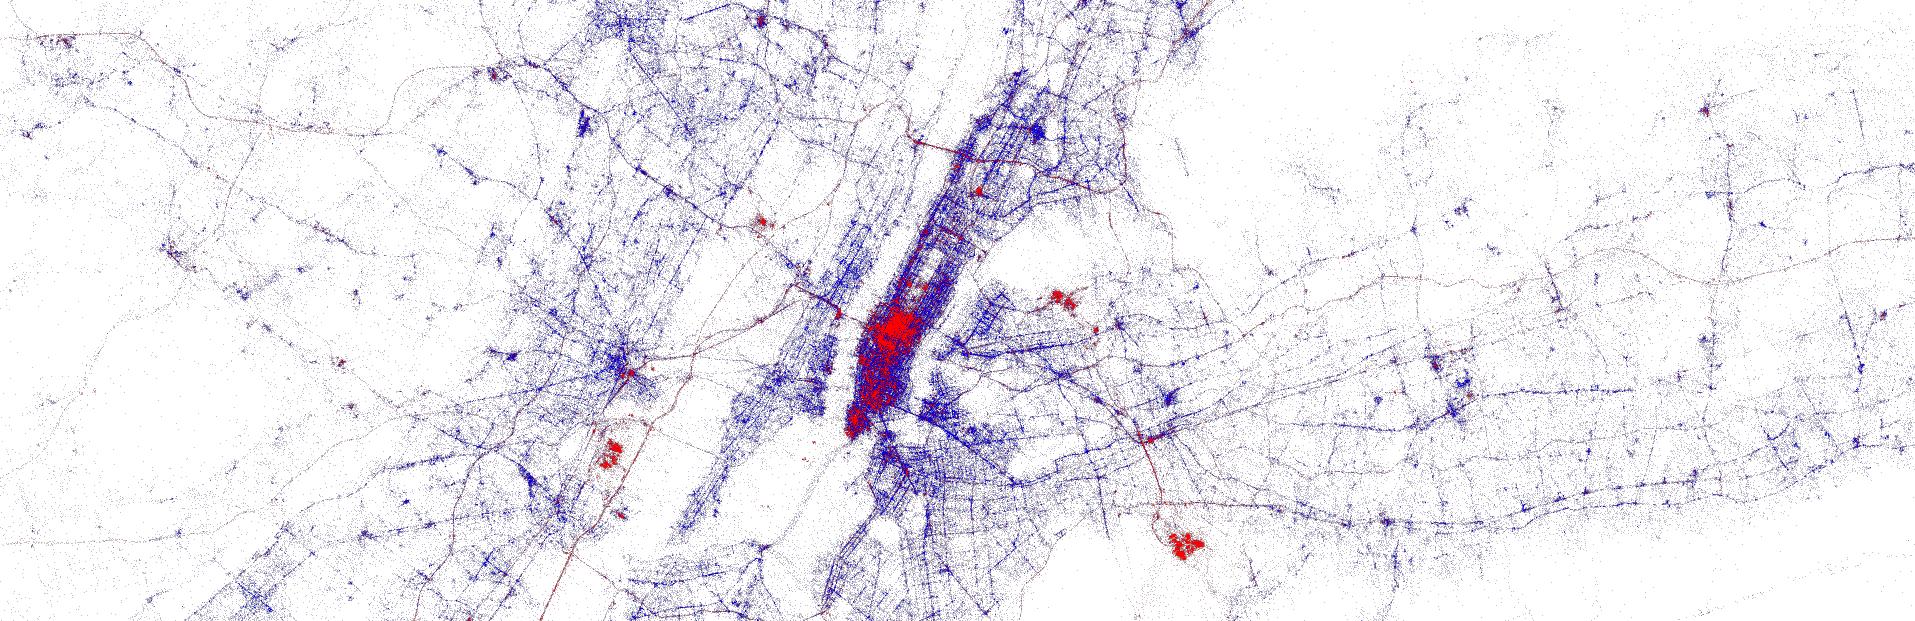 Twitter metadata for NYC